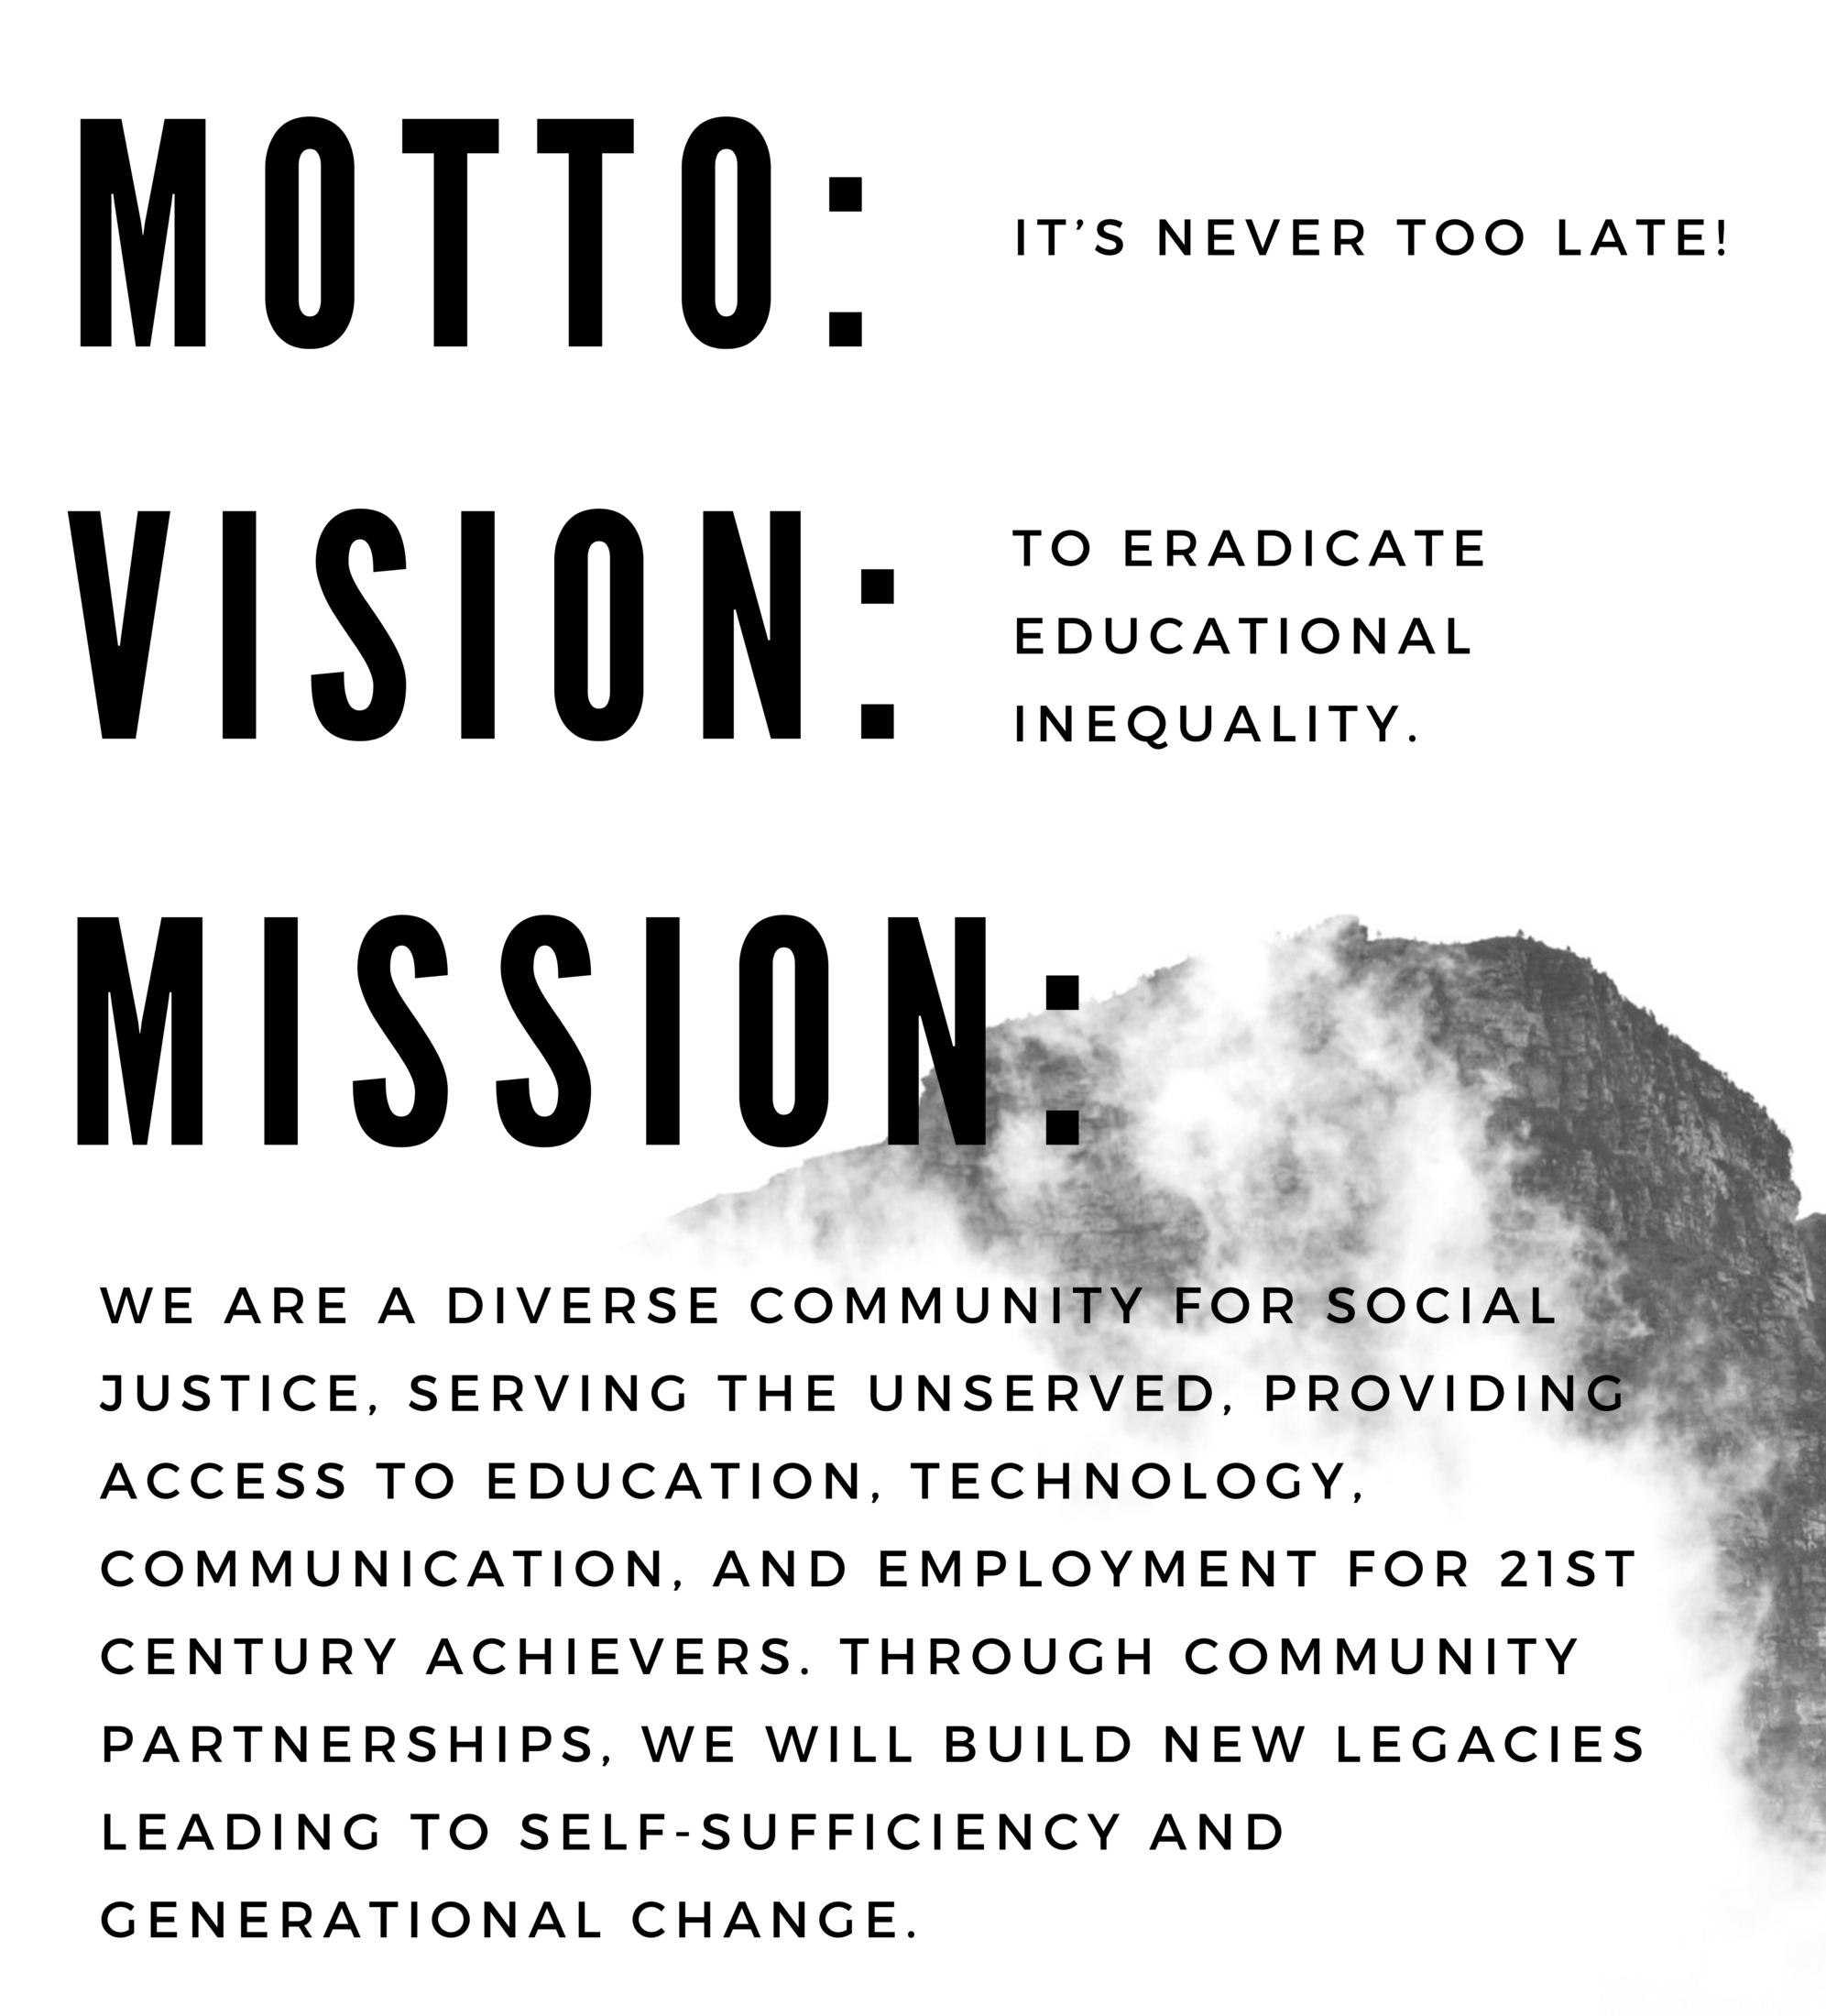 motto, vision, mission